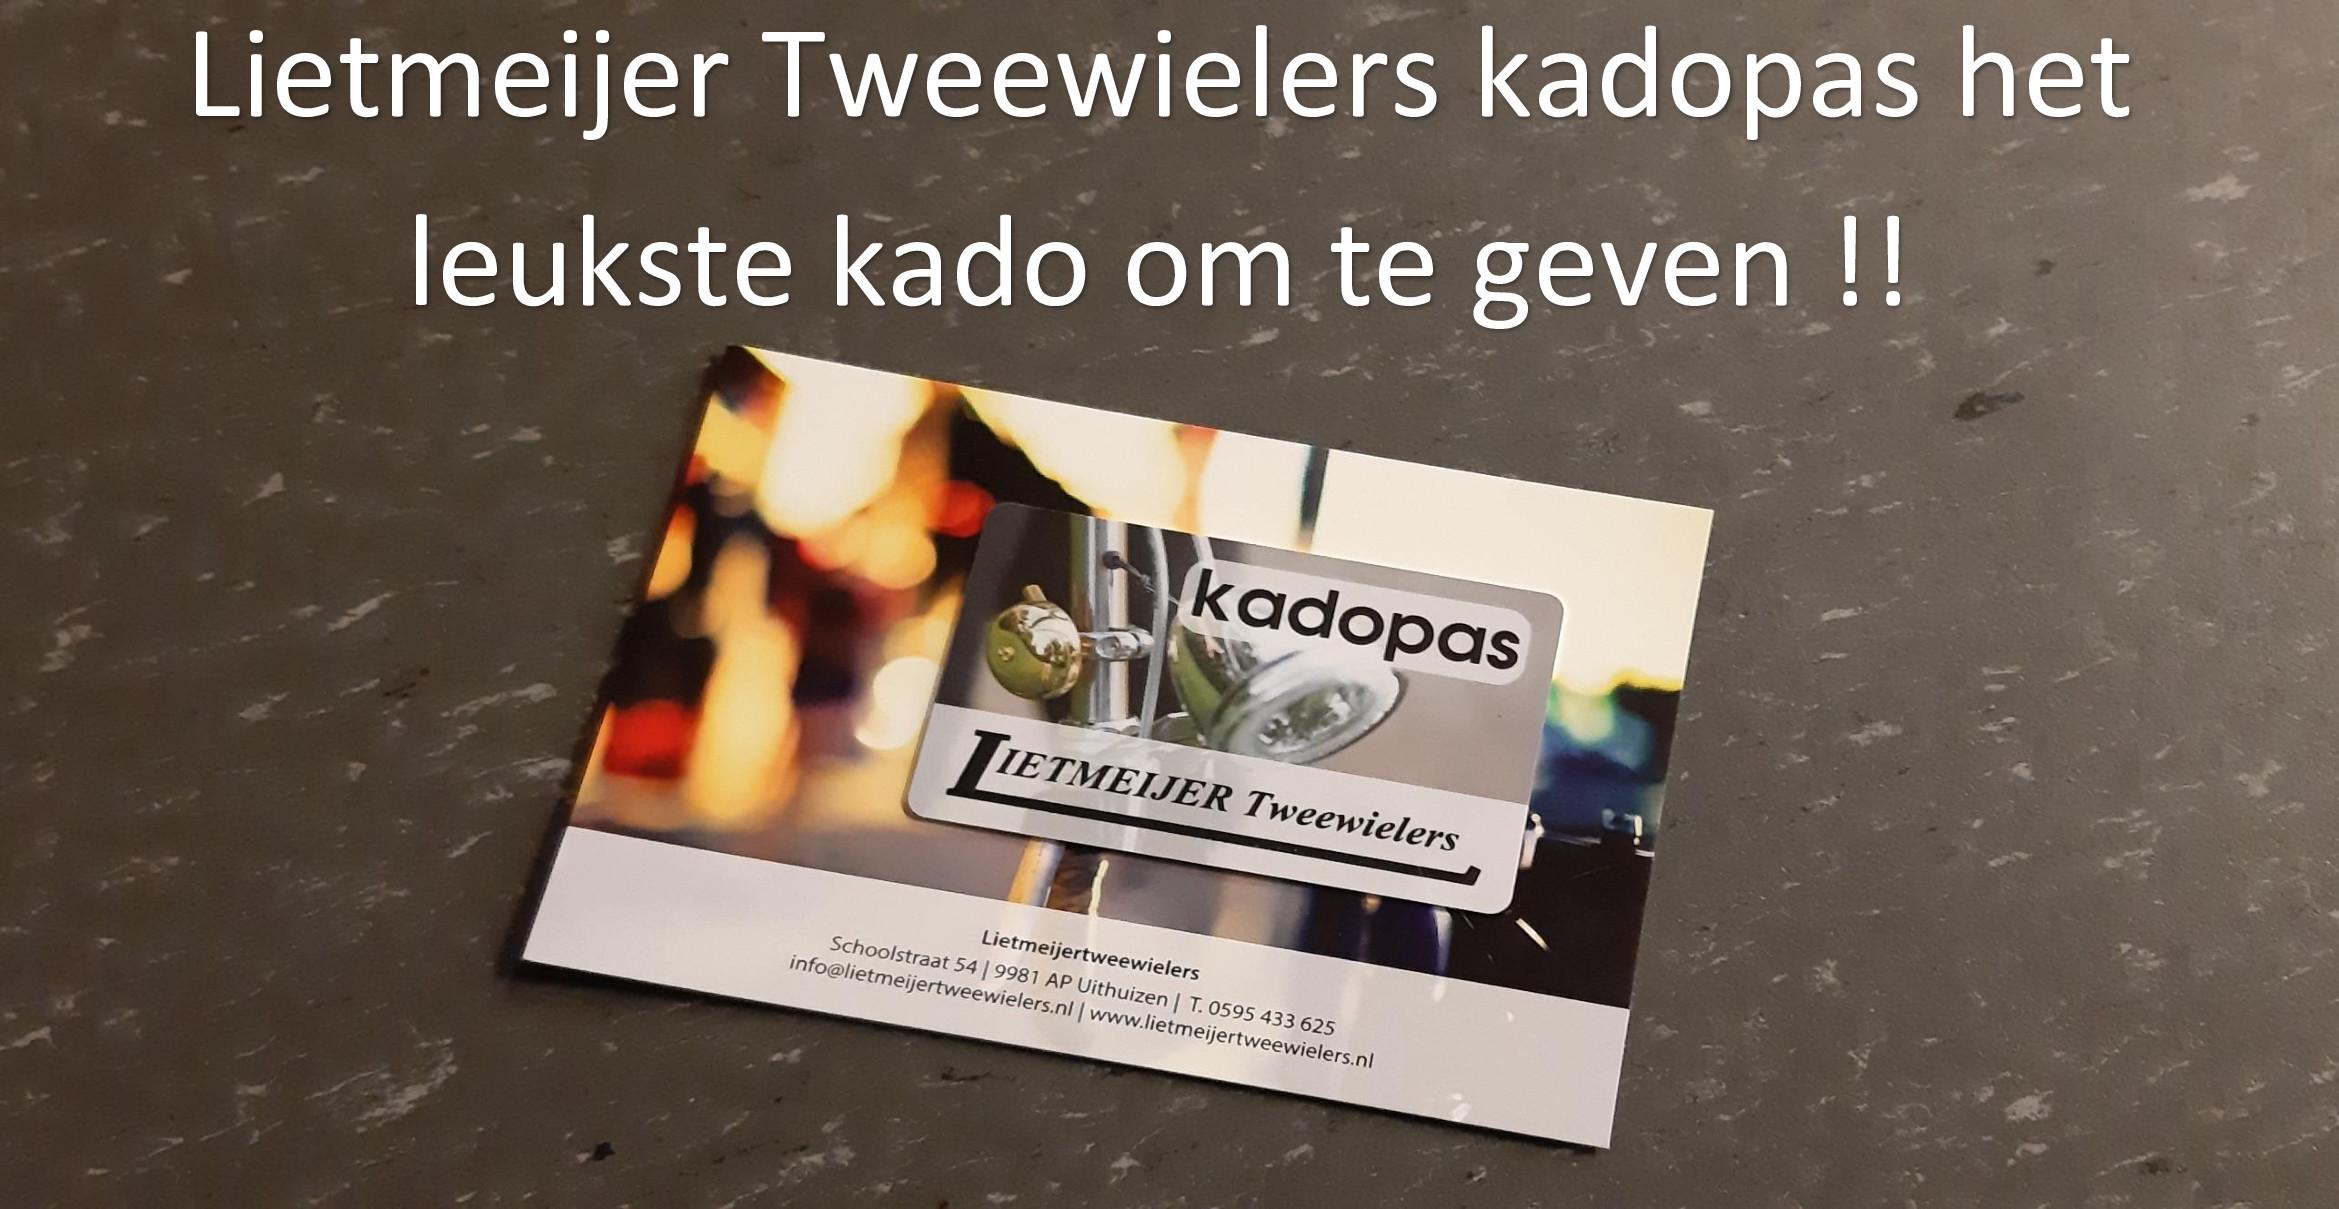 het_leukste_kado_om_te_geven - kopie